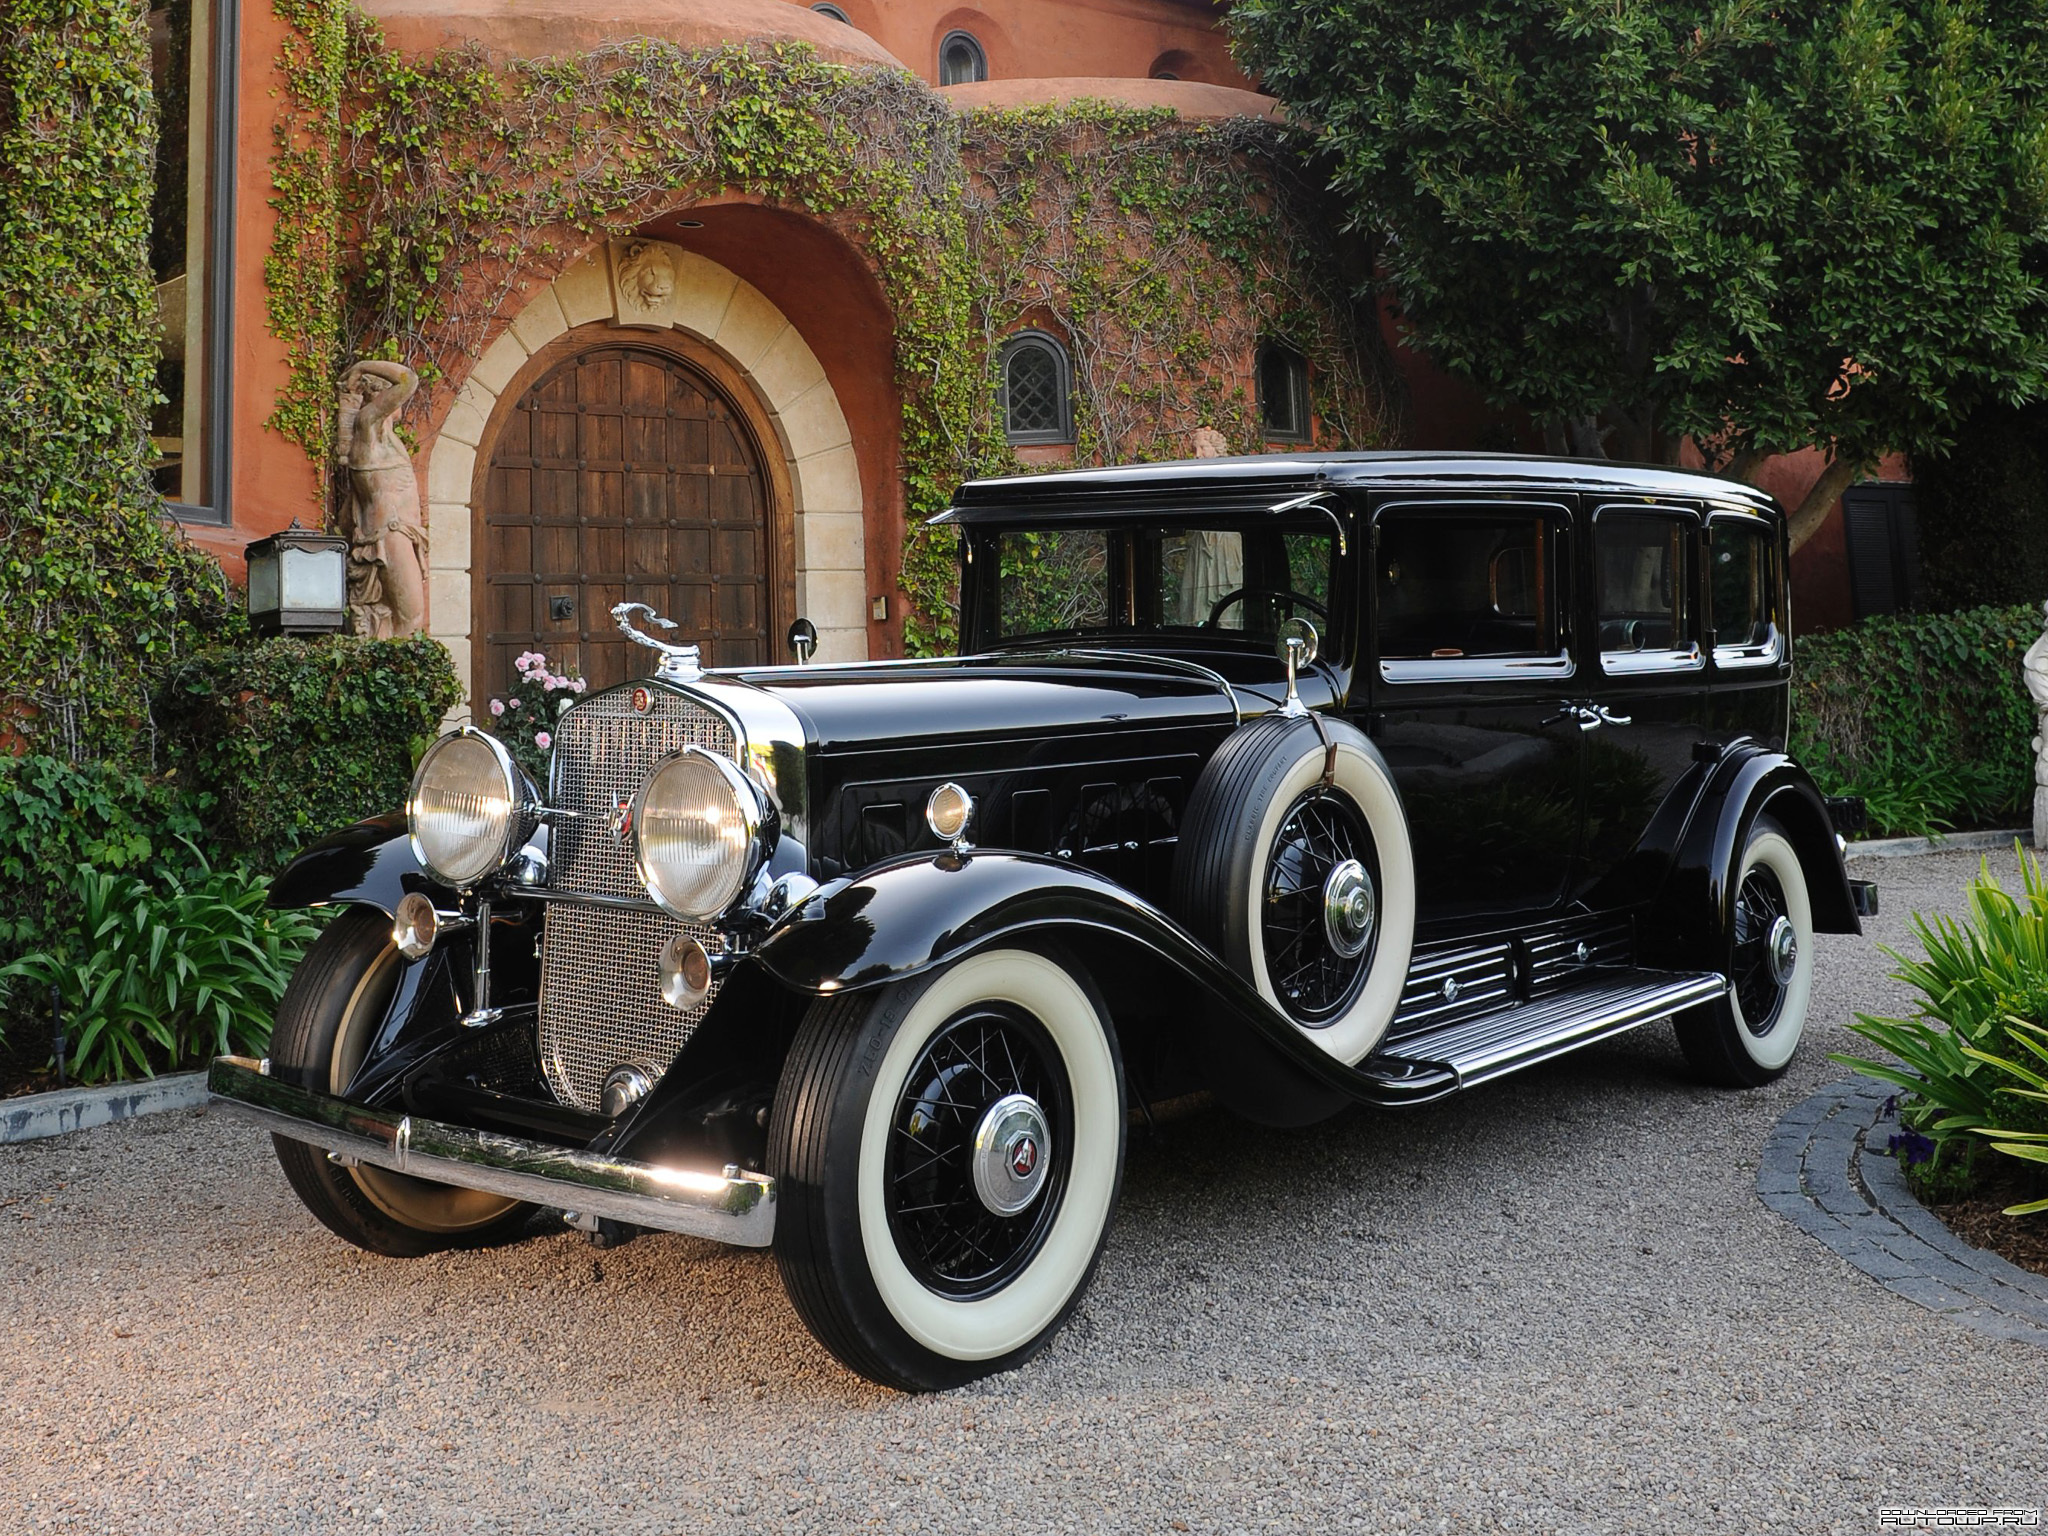 HQ 1930 Cadillac V16 Imperial Sedan Wallpapers | File 1482.27Kb